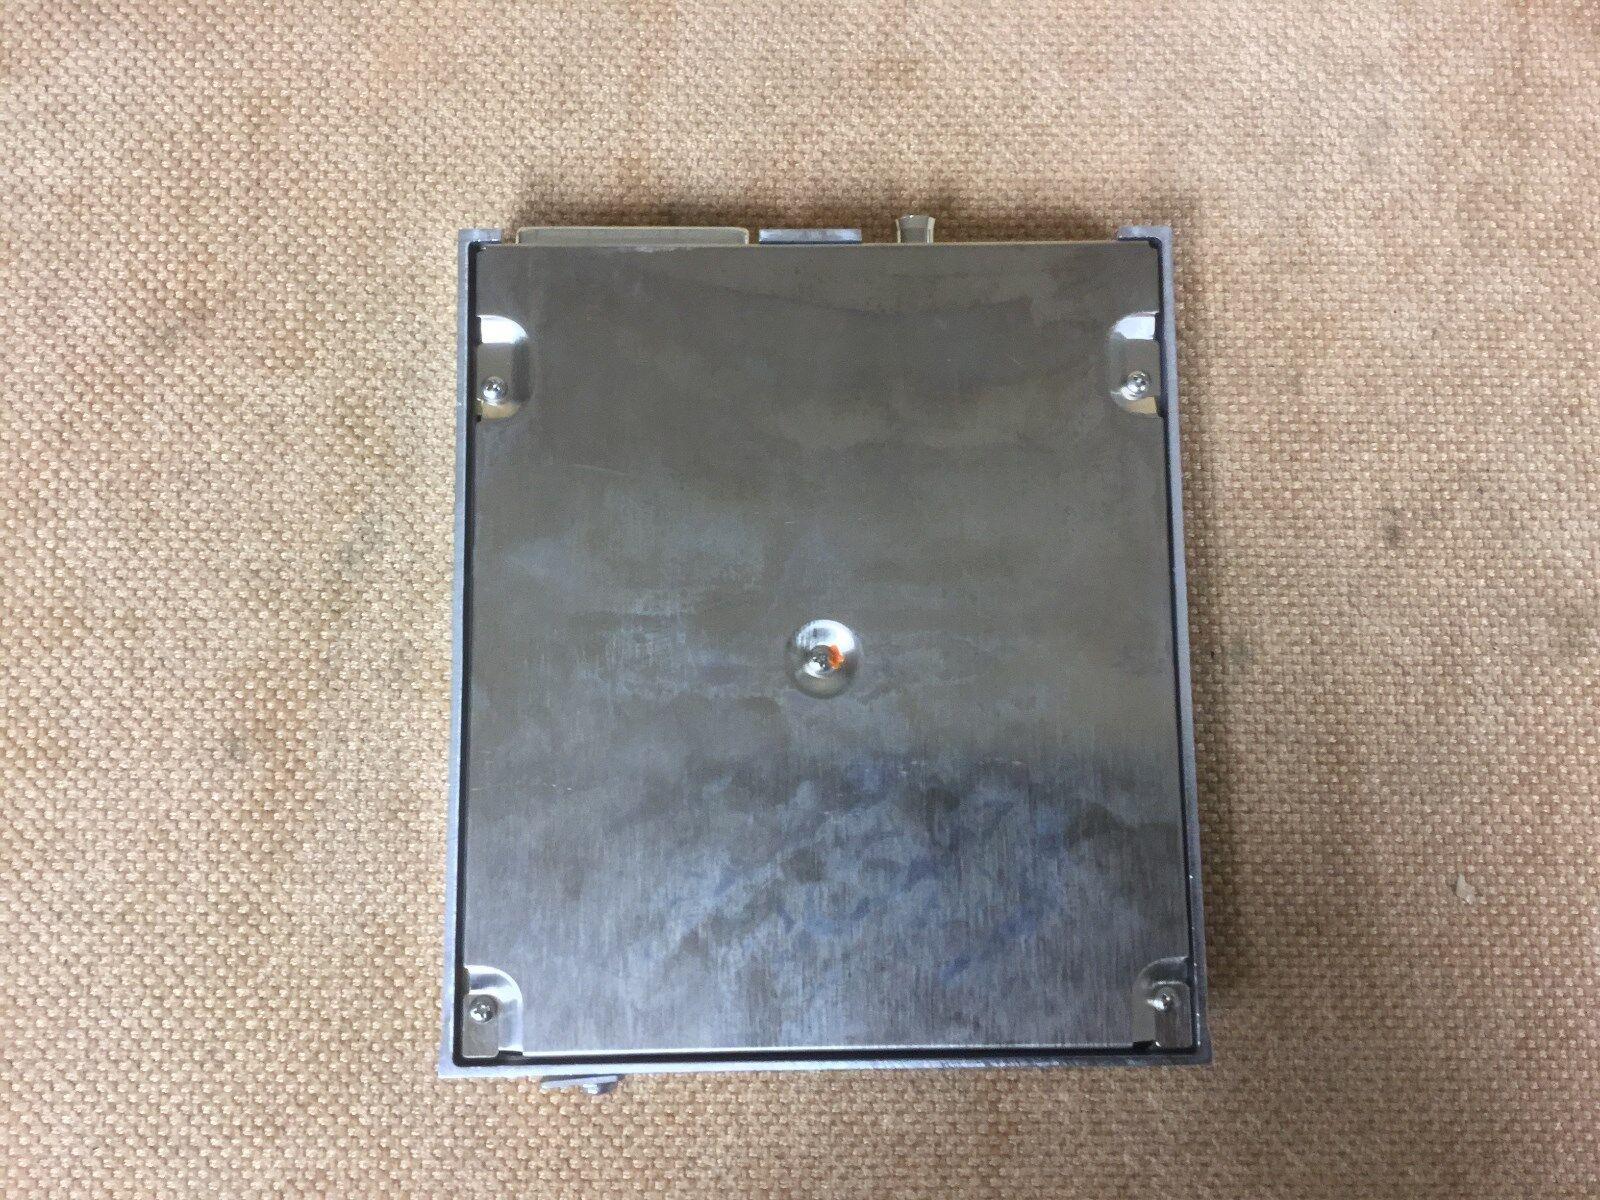 Garmin GDL69 XM Radio Receiver P/N 011-00986-00